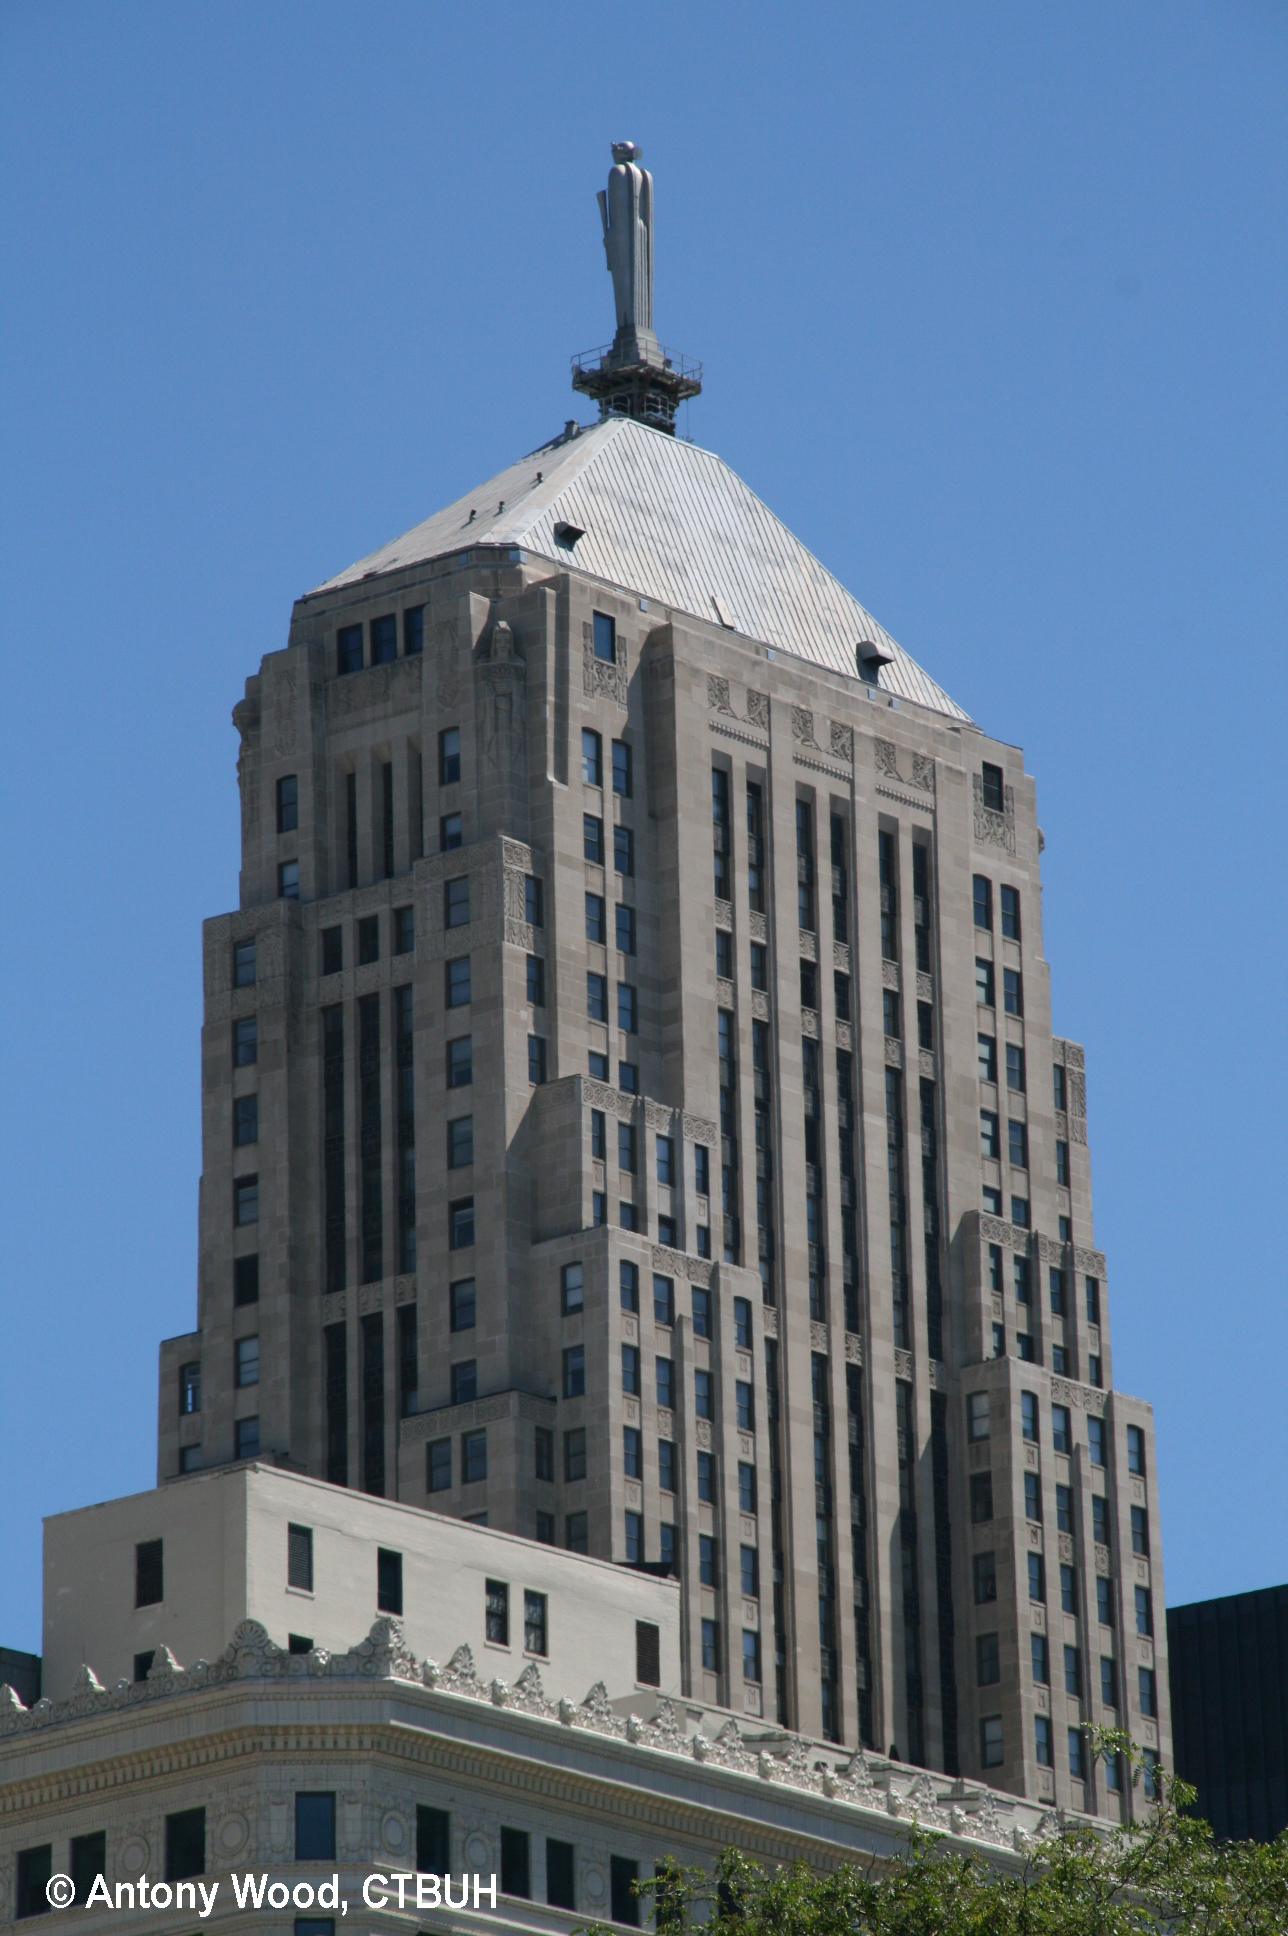 Usaa Contact Us >> Chicago Board of Trade - The Skyscraper Center